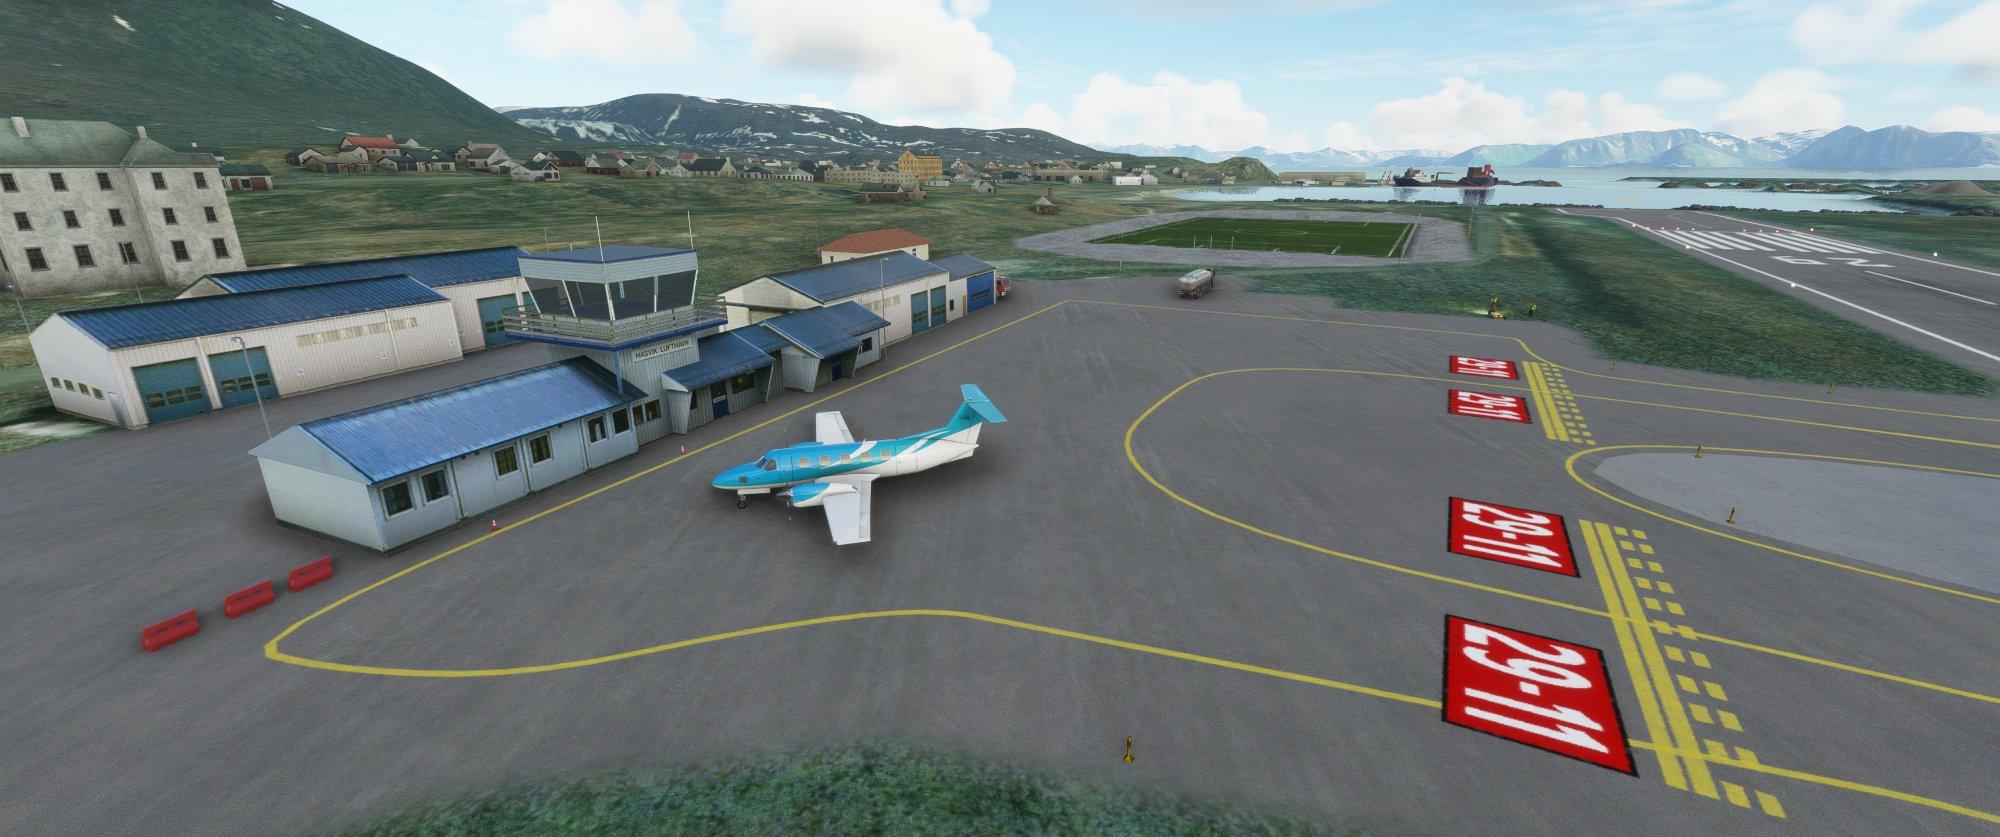 Microsoft Flight Simulator Screenshot 2020.11.19 - 17.51.24.83.jpg